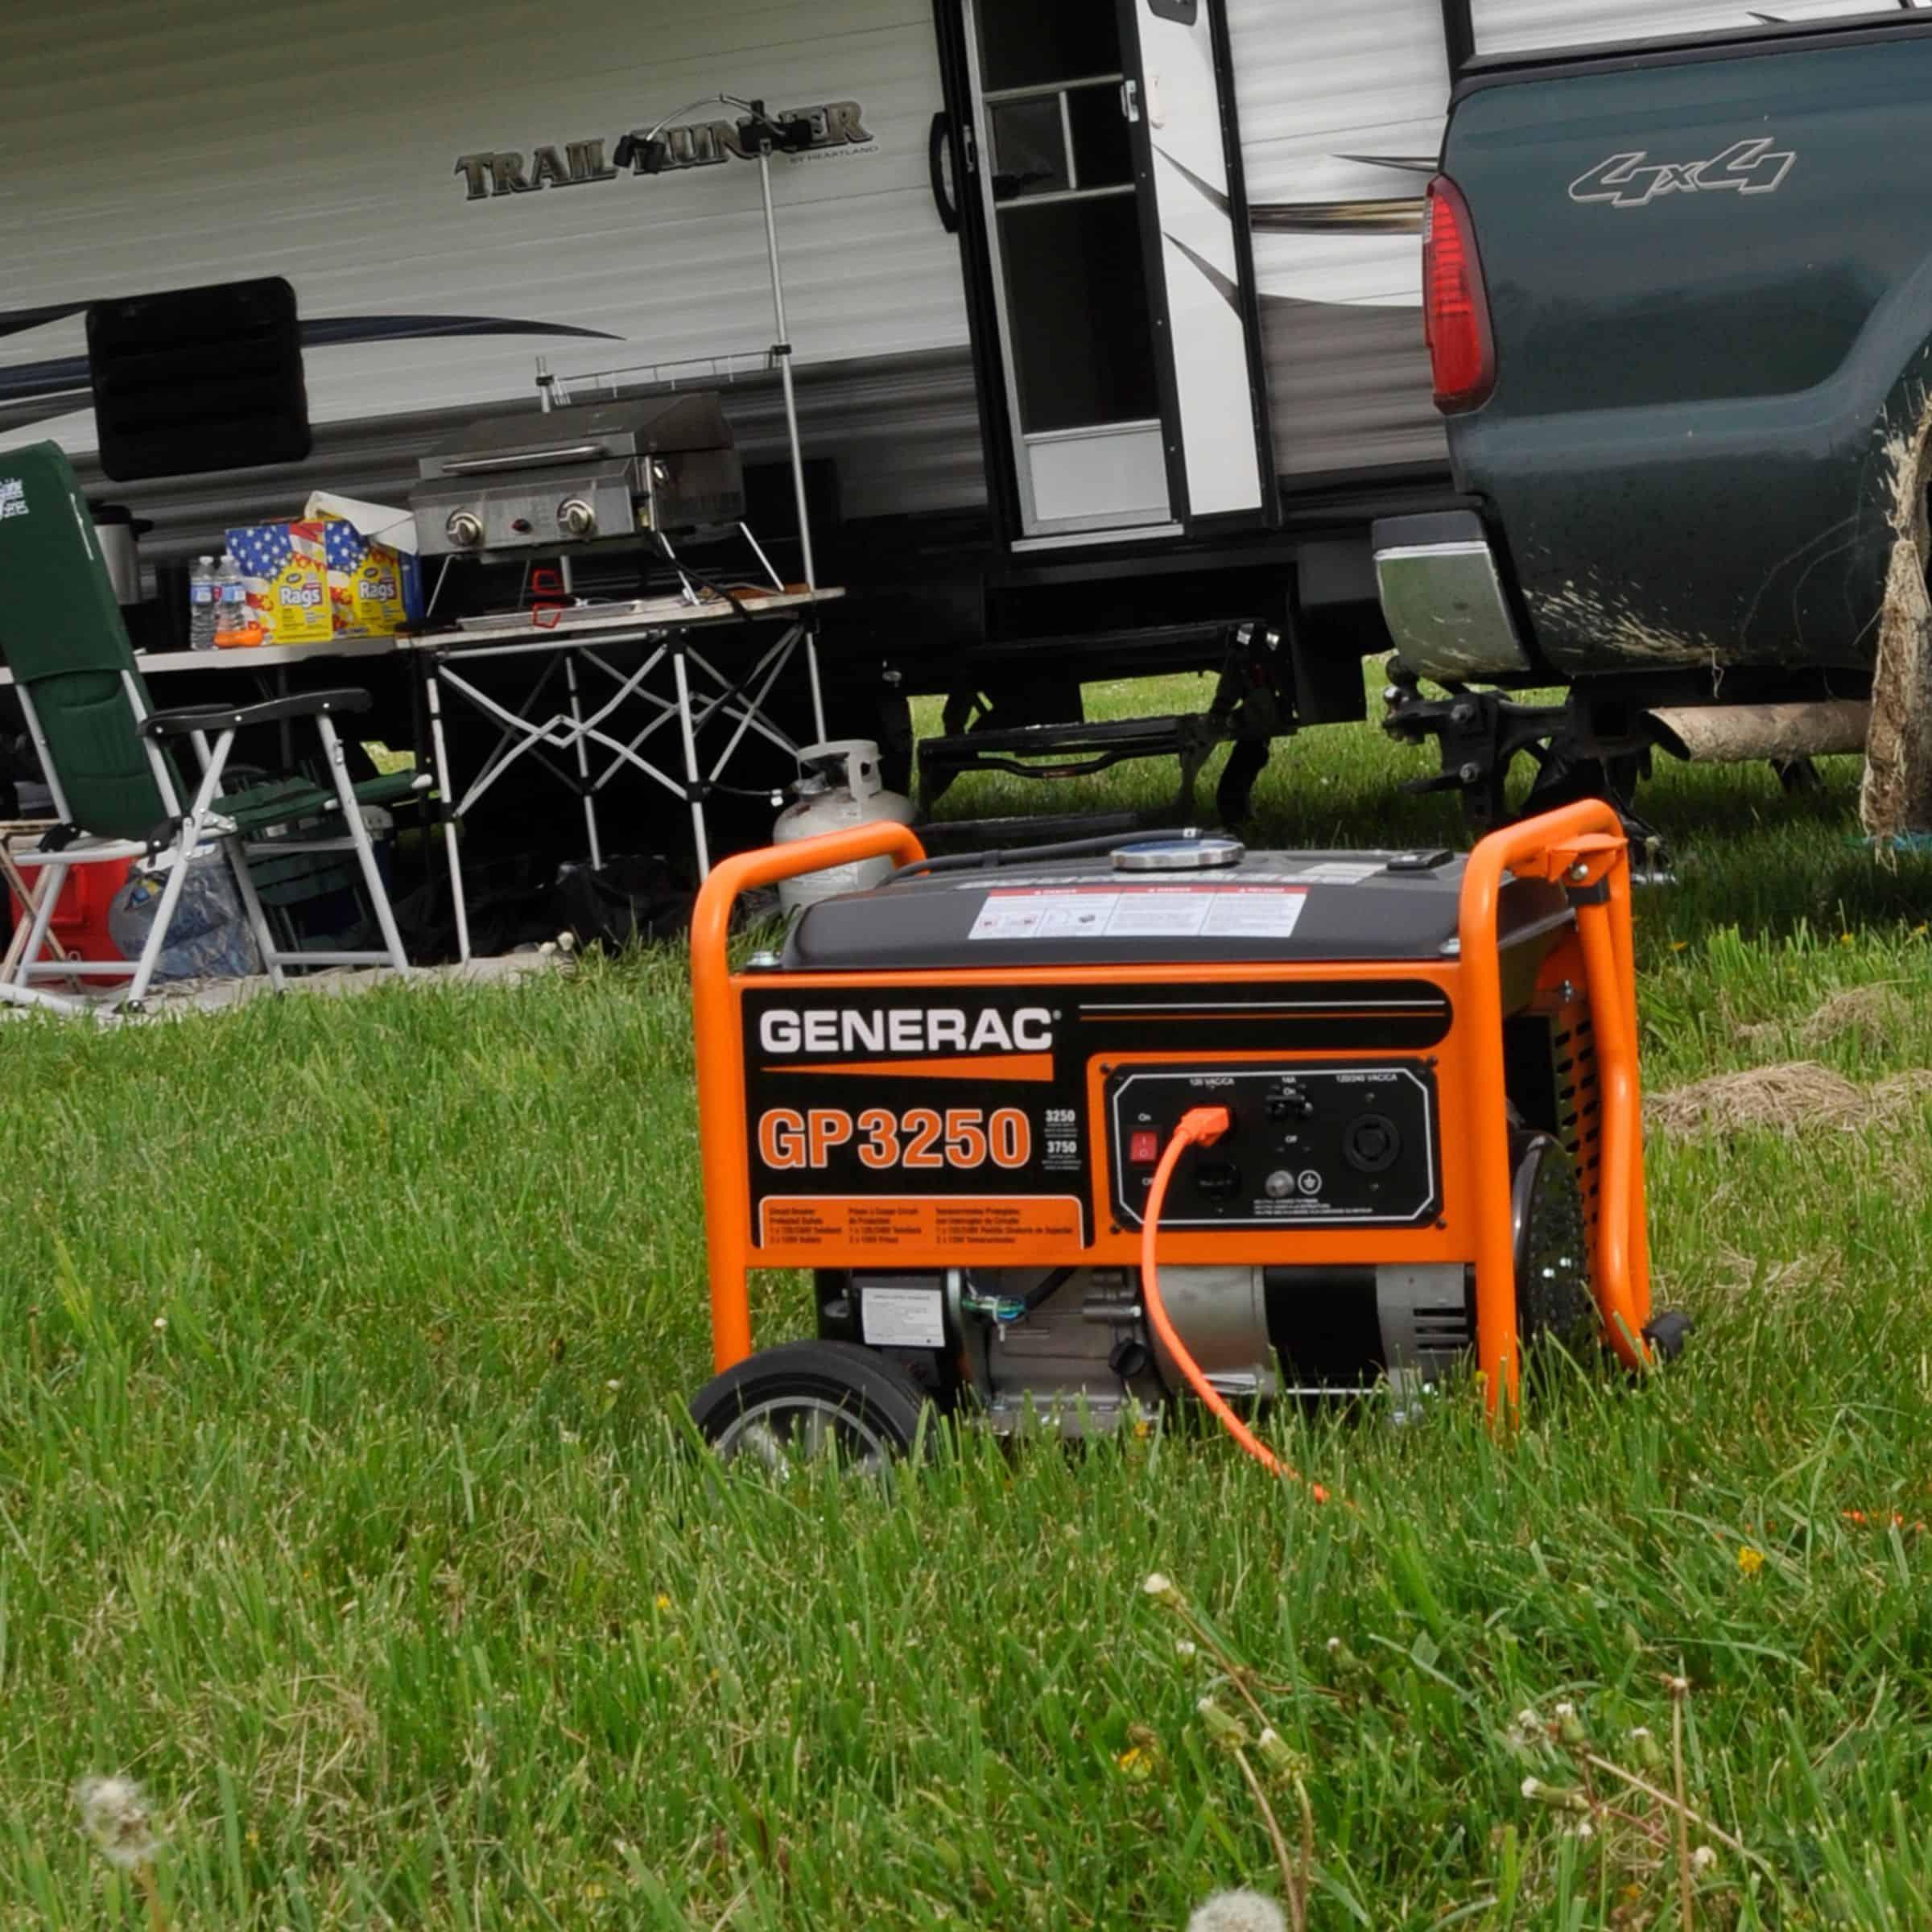 GP 3250 Watt Portable Generator in front of RV